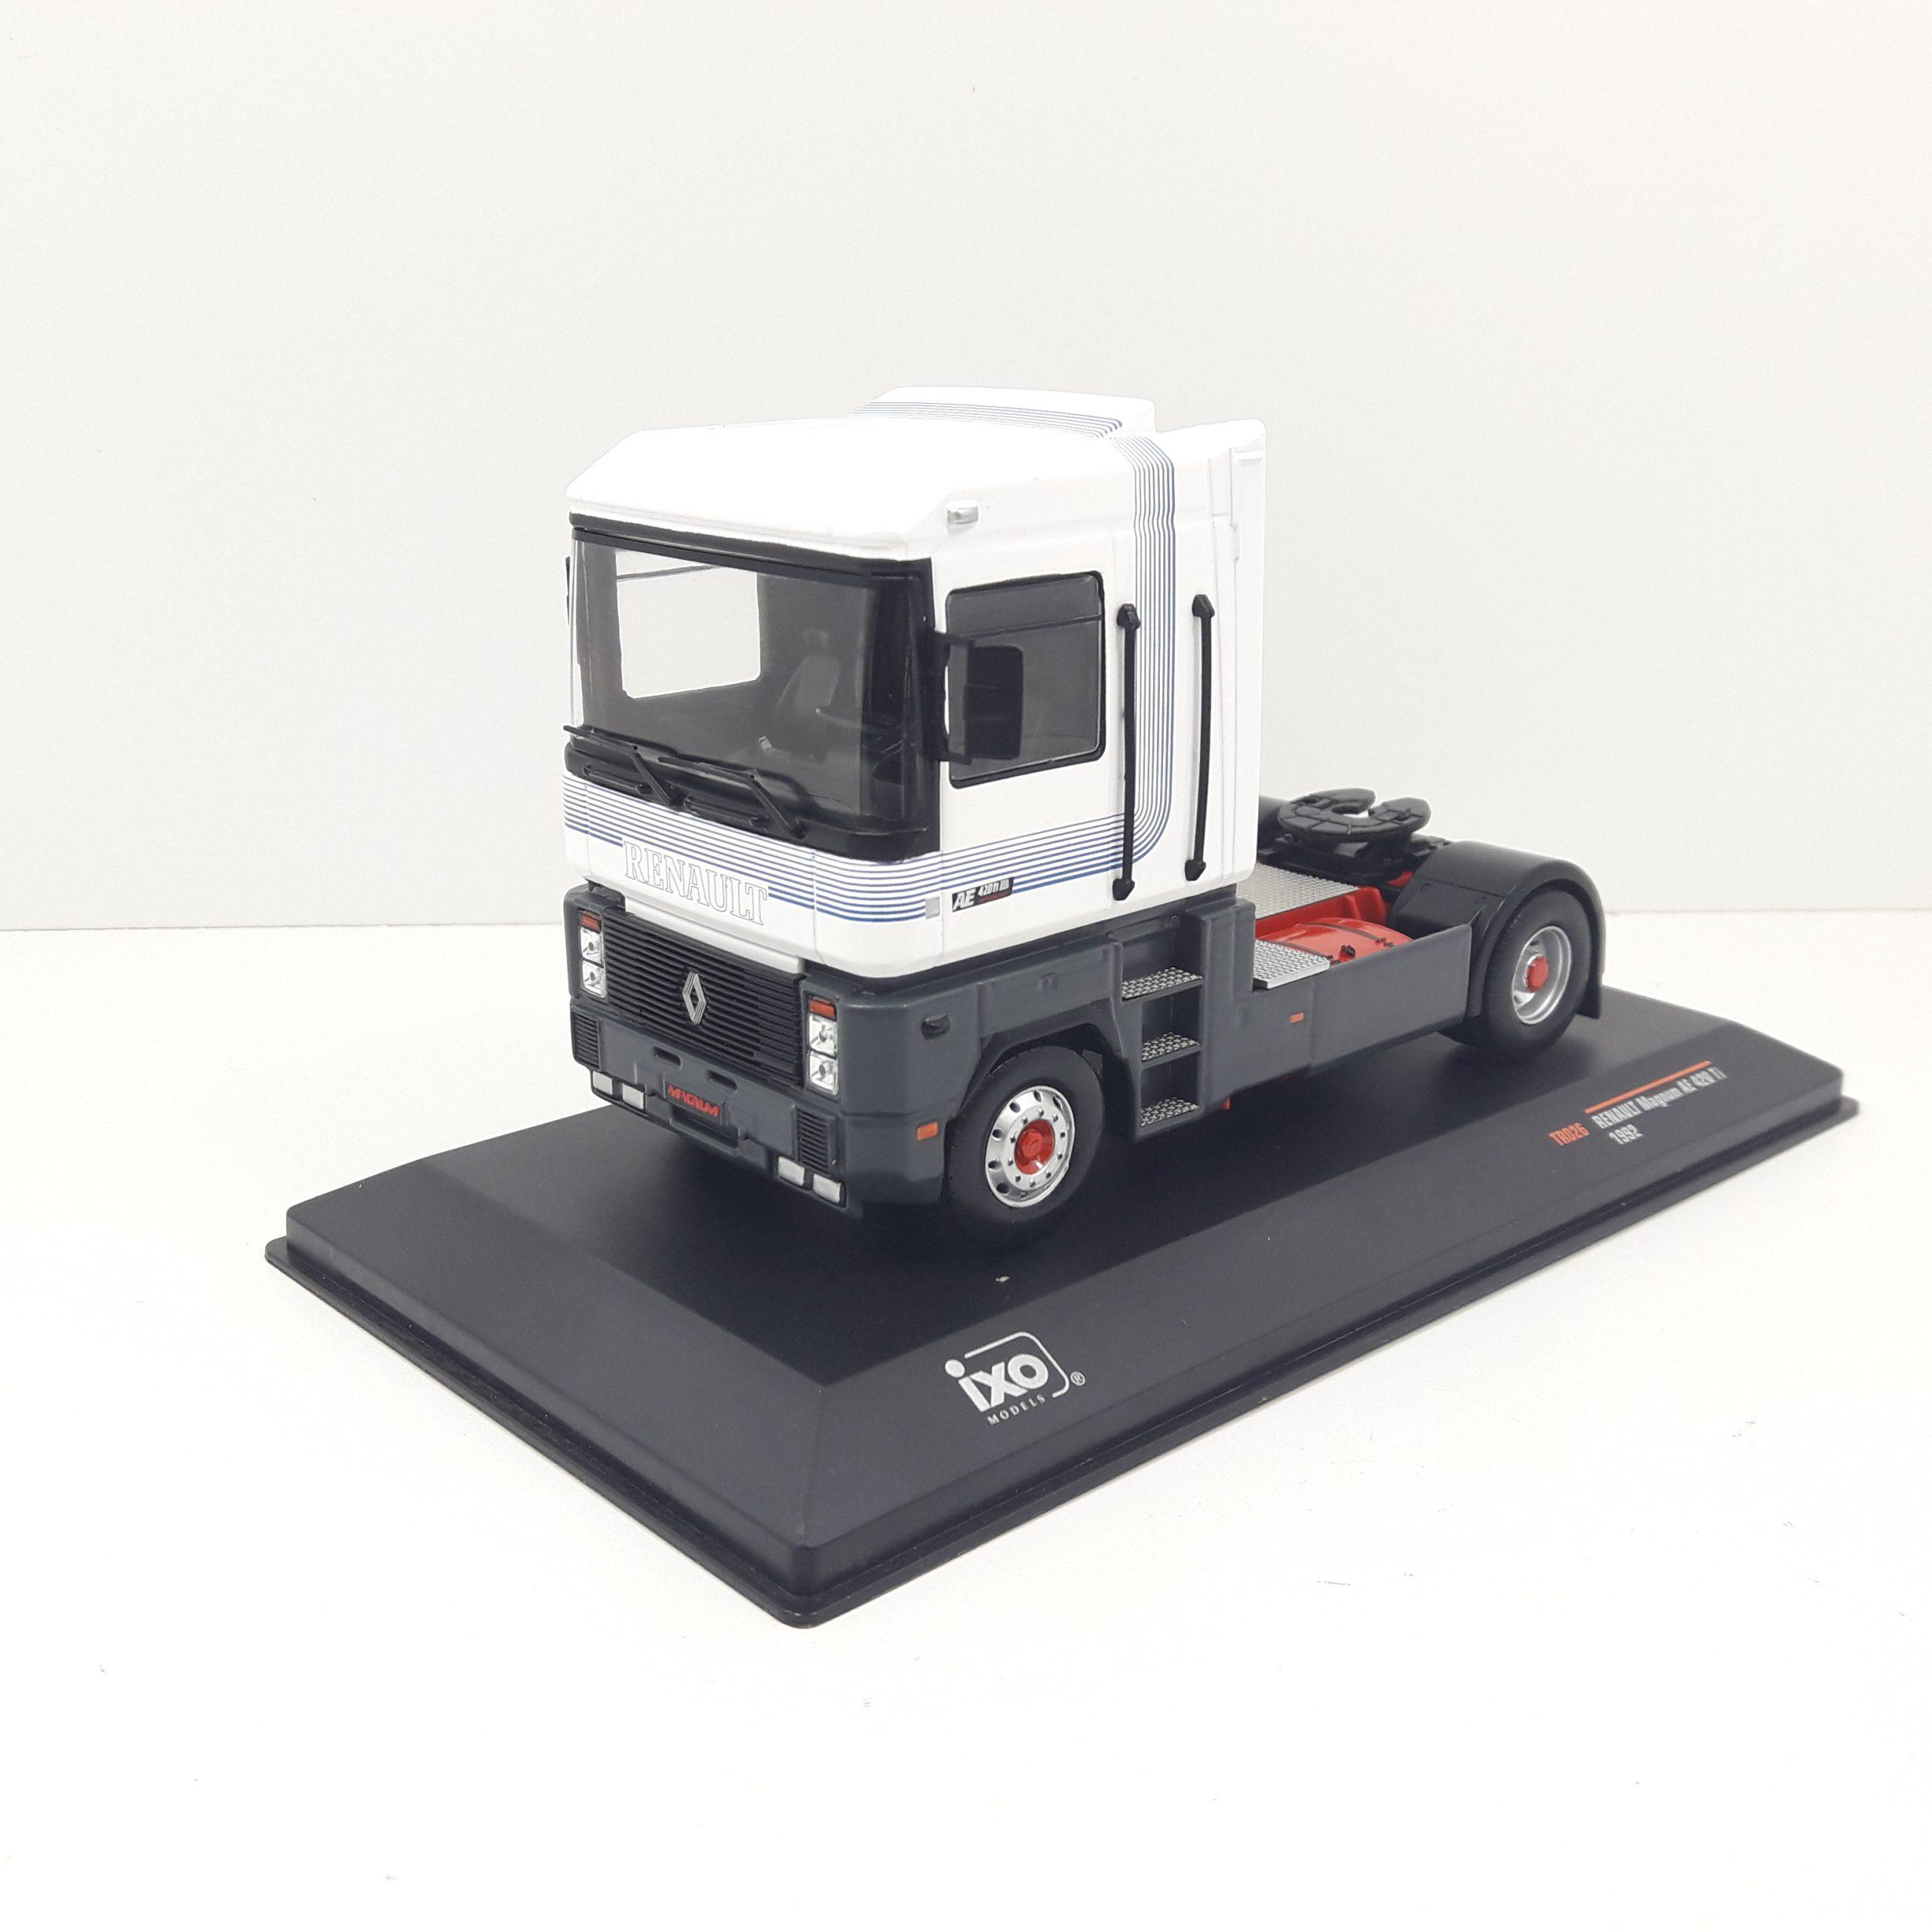 tractor camión Kamaz 6460 Modelo de escala 1:43 de camión